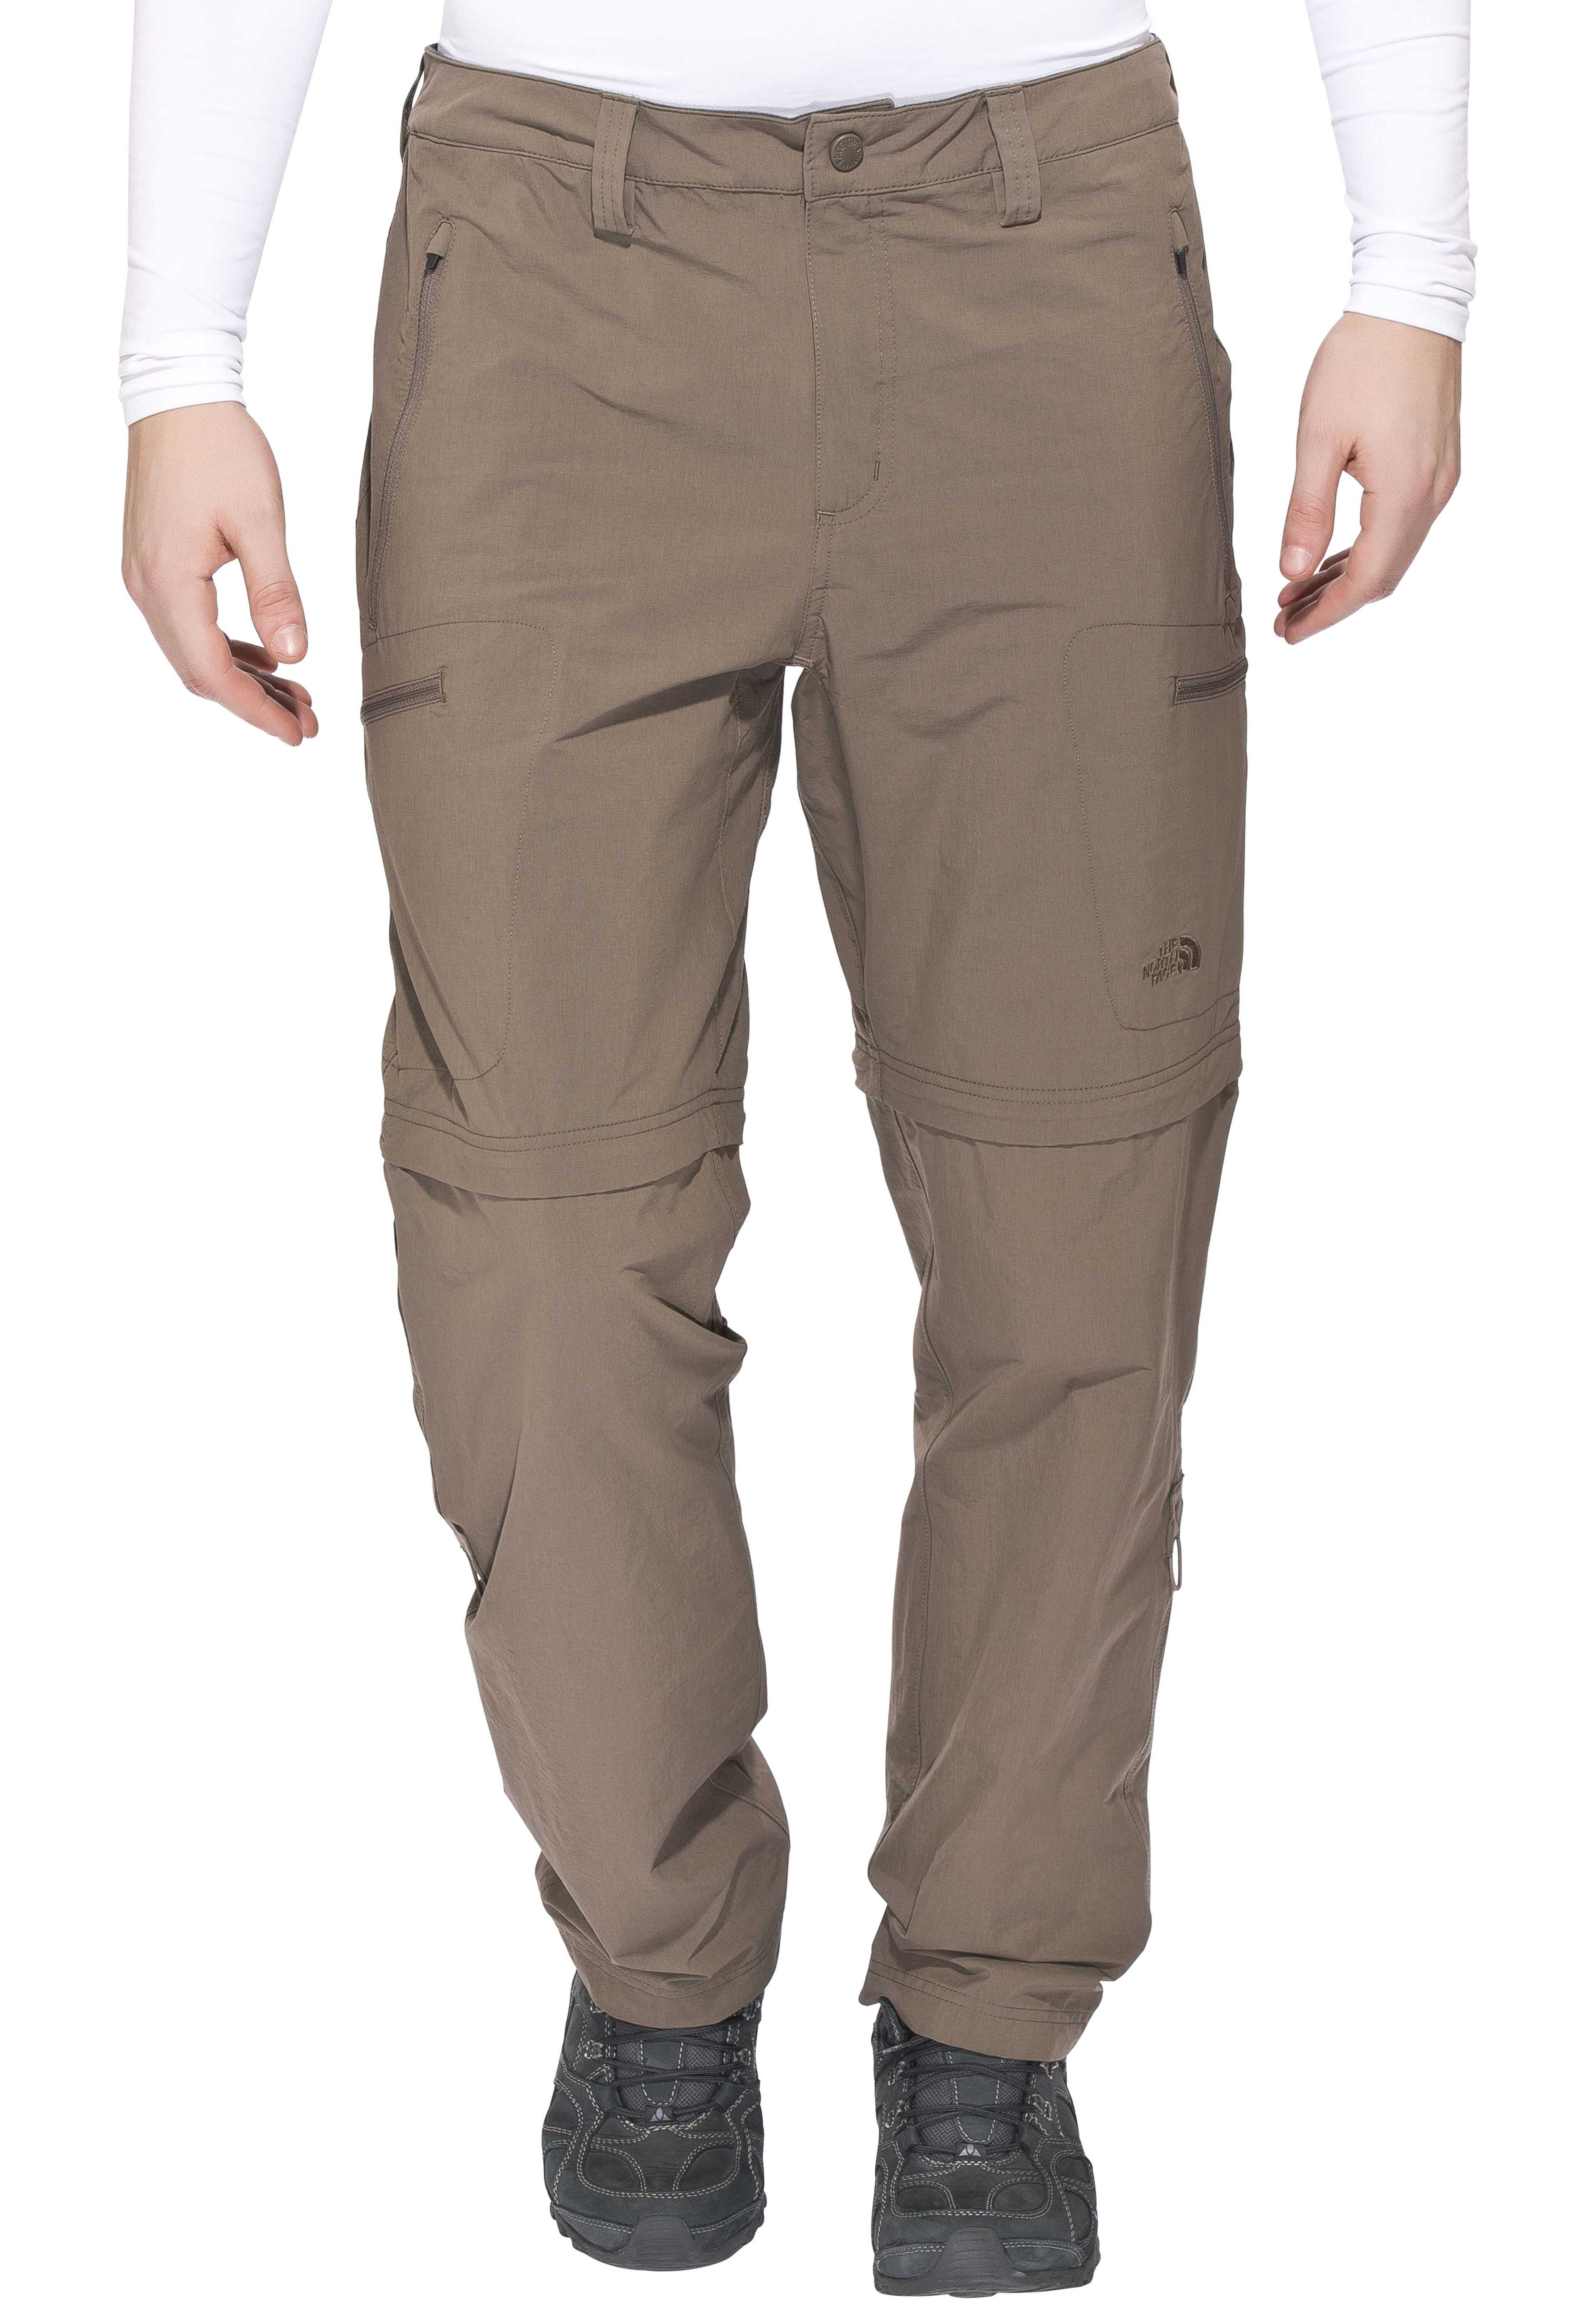 The North Face Exploration Pantalones Convertibles Largo Hombre Weimaraner Brown Campz Es